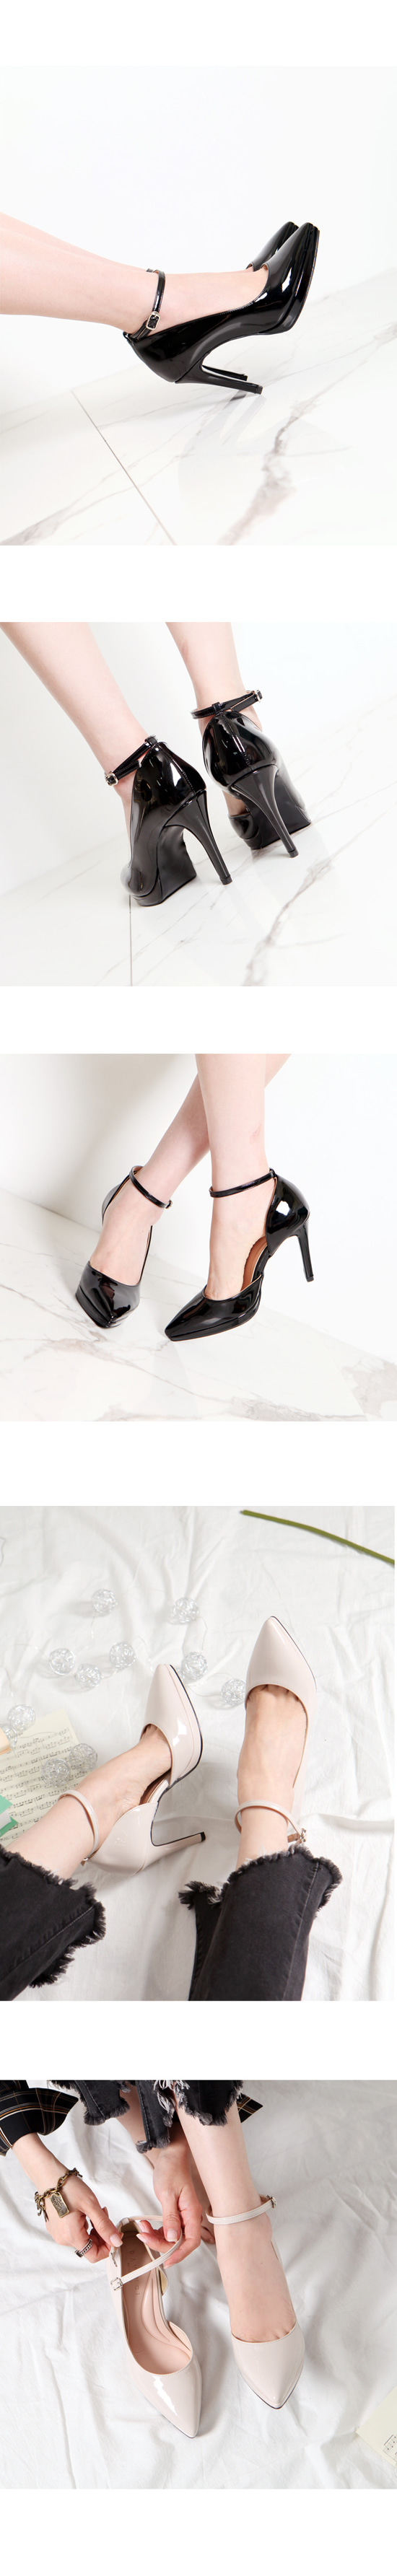 Enamel Heirloom Stiletto High Heels Black